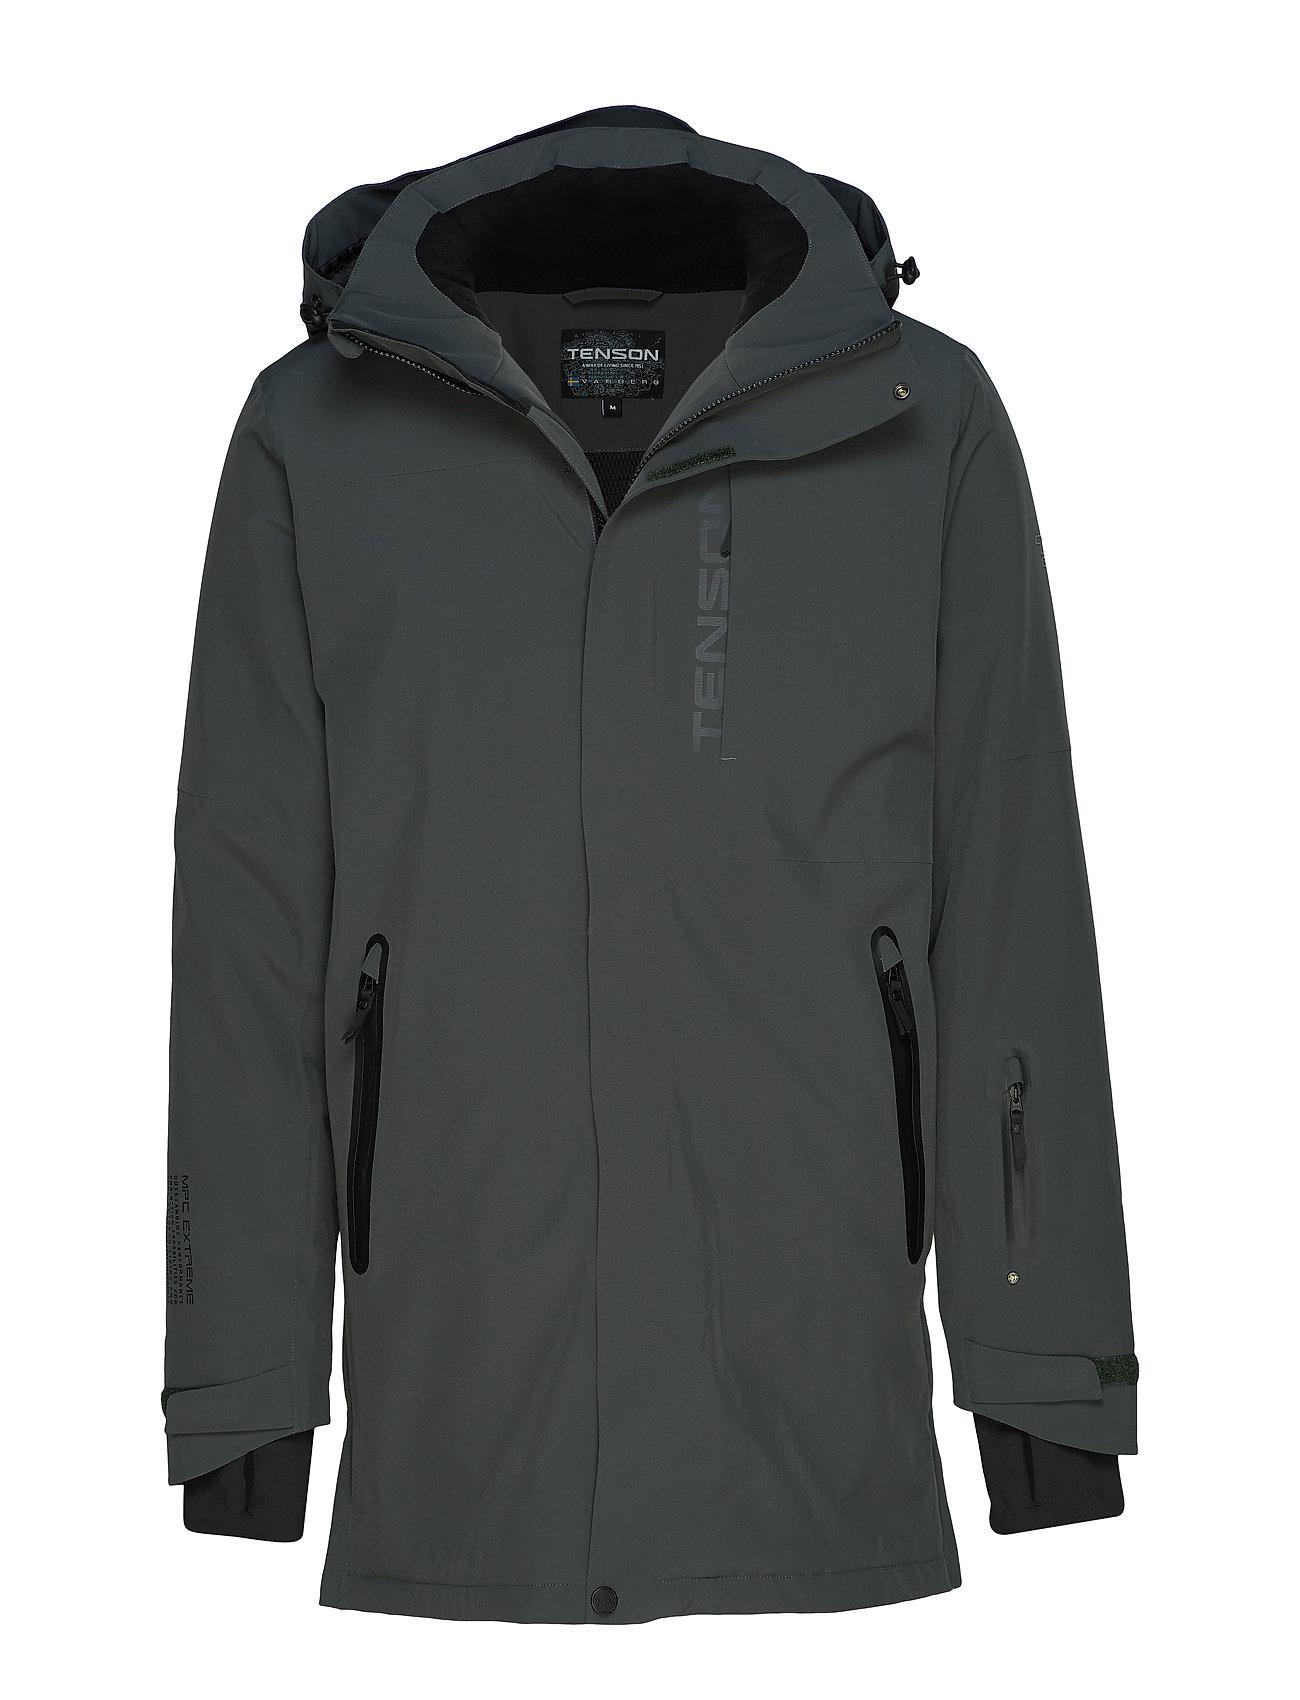 Tenson Spectre coat - KHAKI